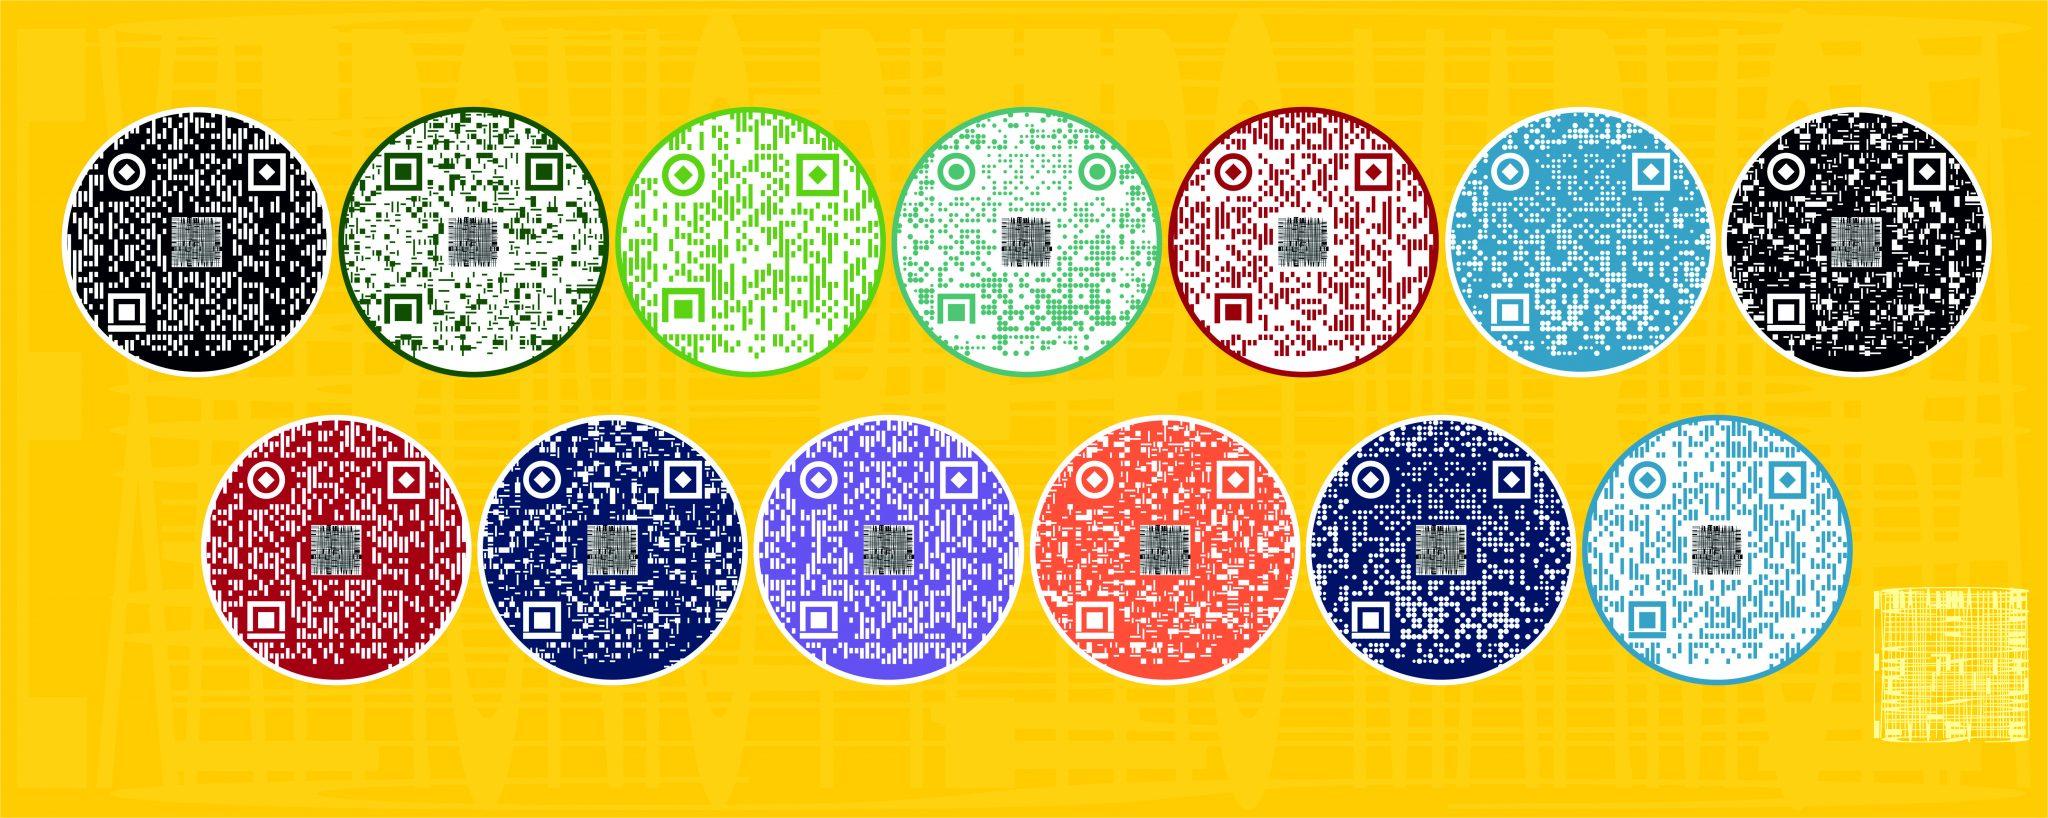 NFT digital art (no fungible token)